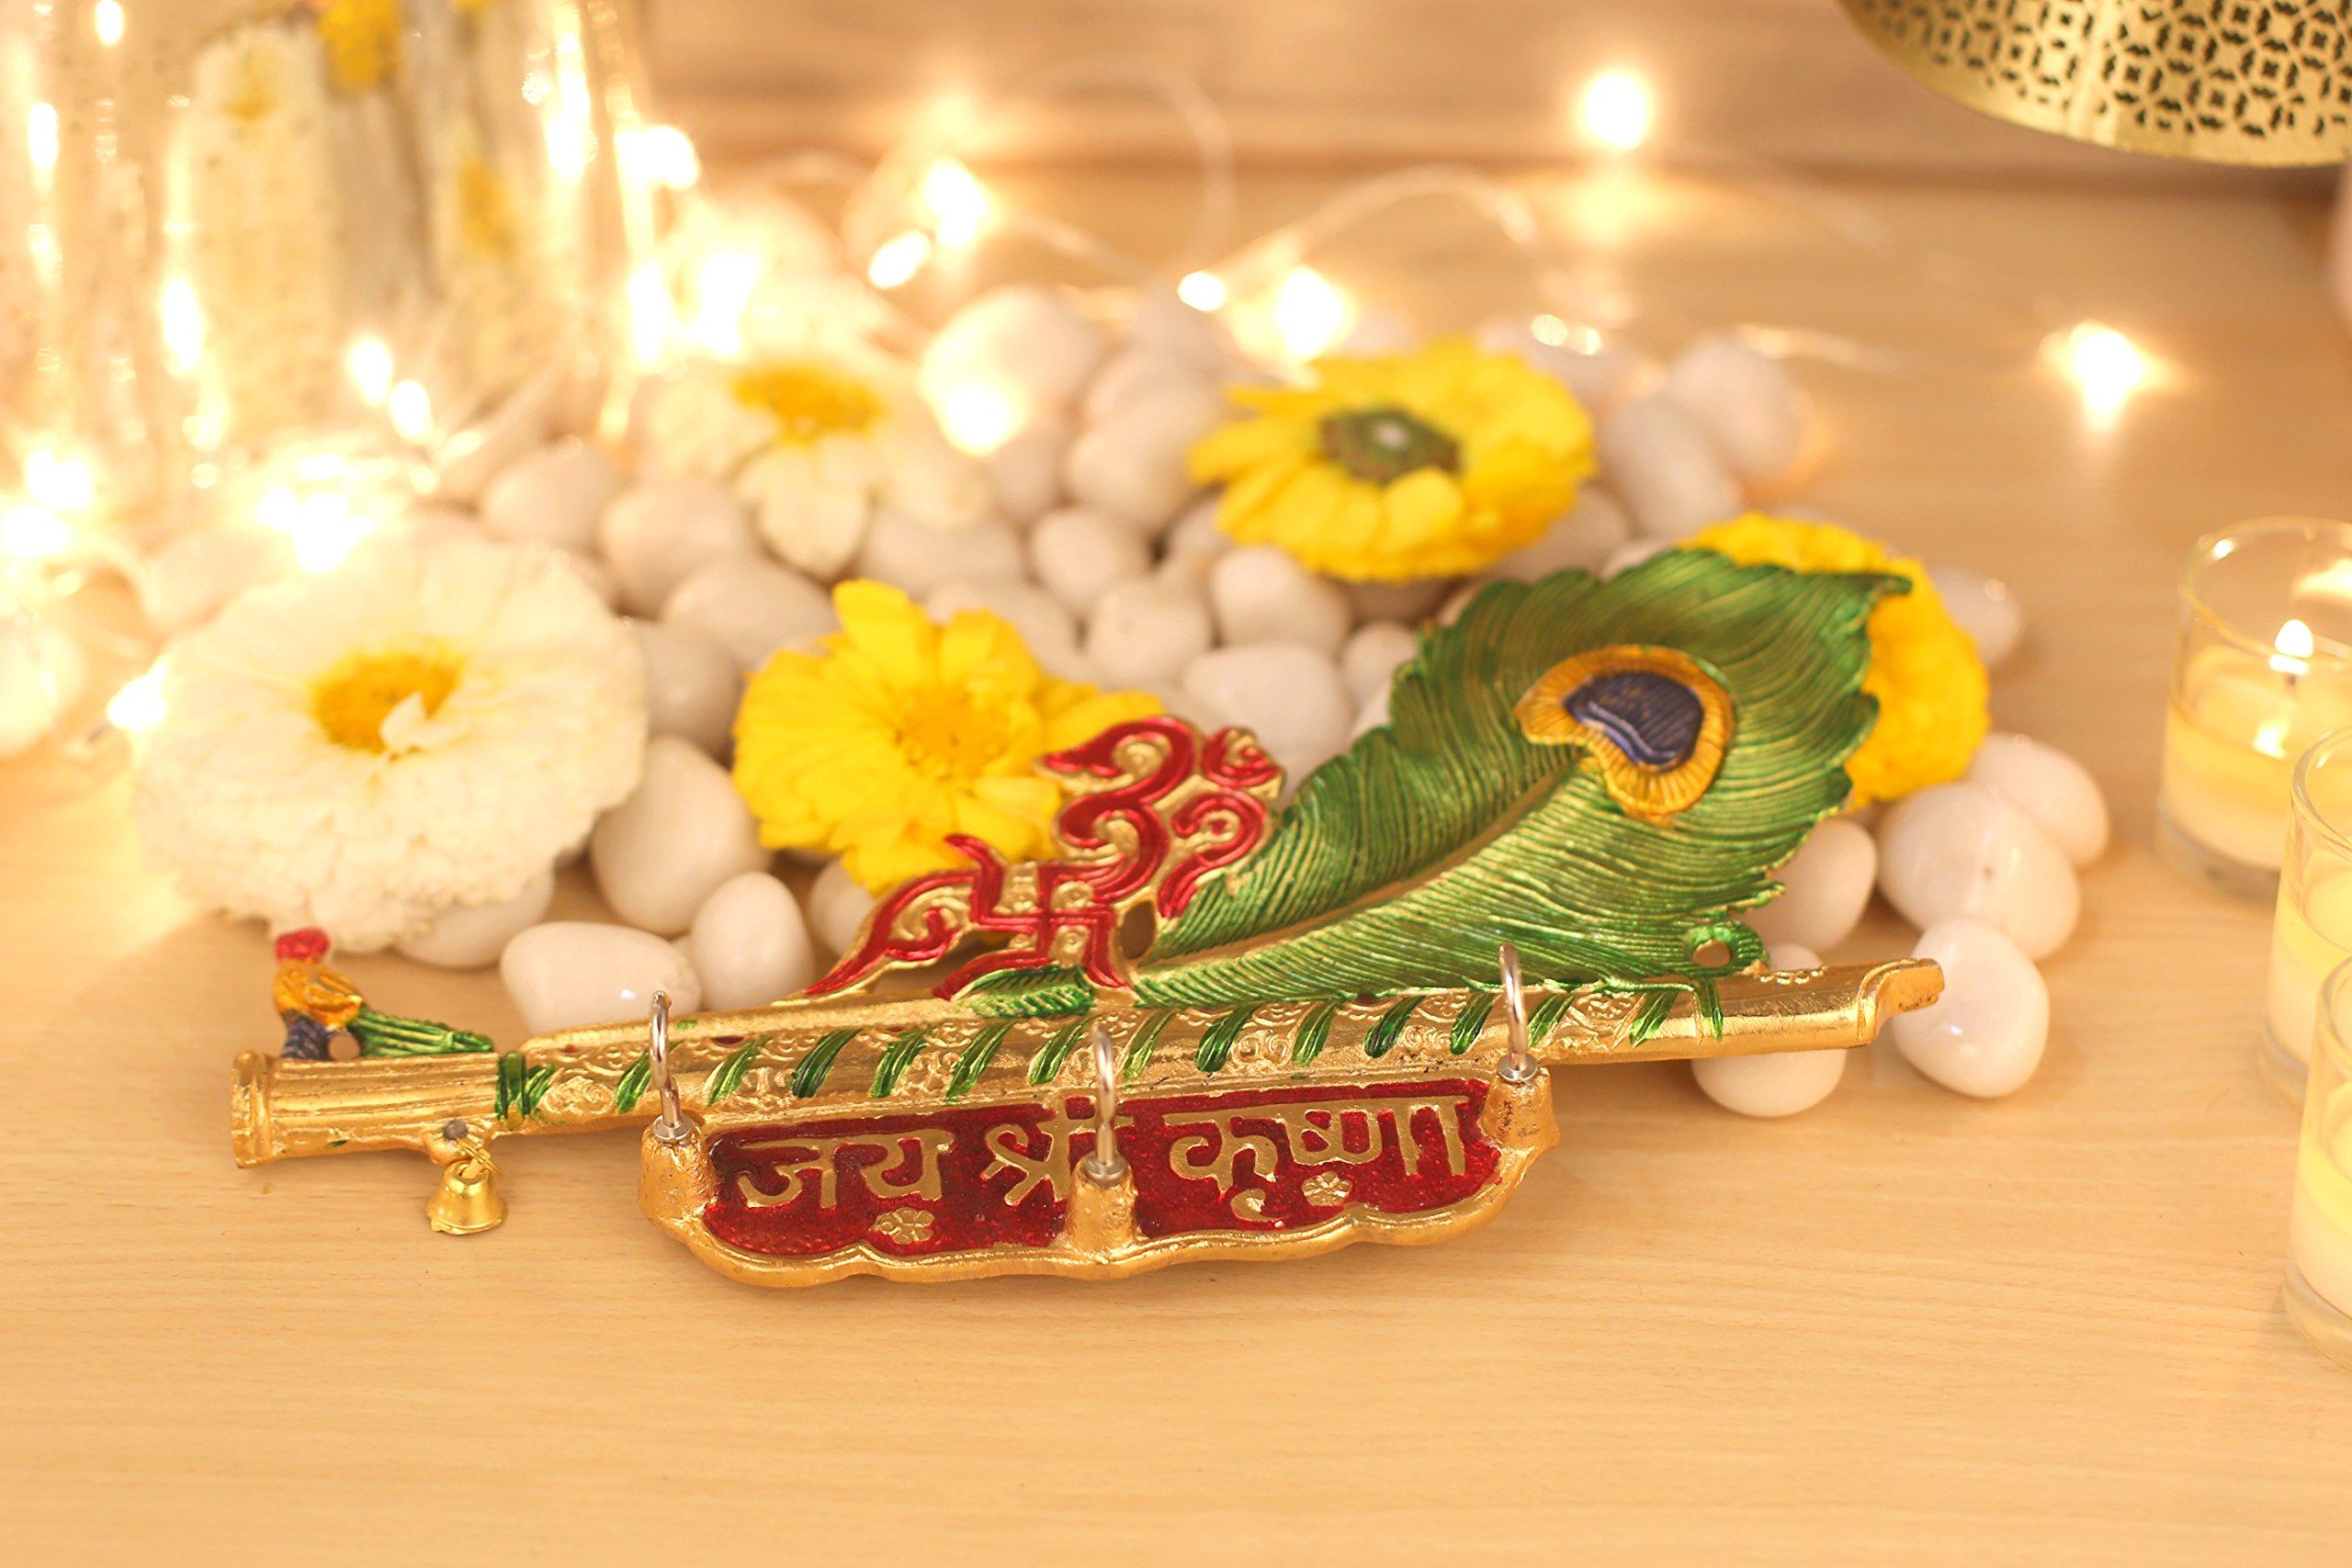 Aatm Decorative & Attacractive Brass Beautiful Handicraft Krishna Ji Flute Multi Purpose Hanger with MOR Pankh Design   Home Use/Wall Decoration/Key Hanger/Cloth Hanger  